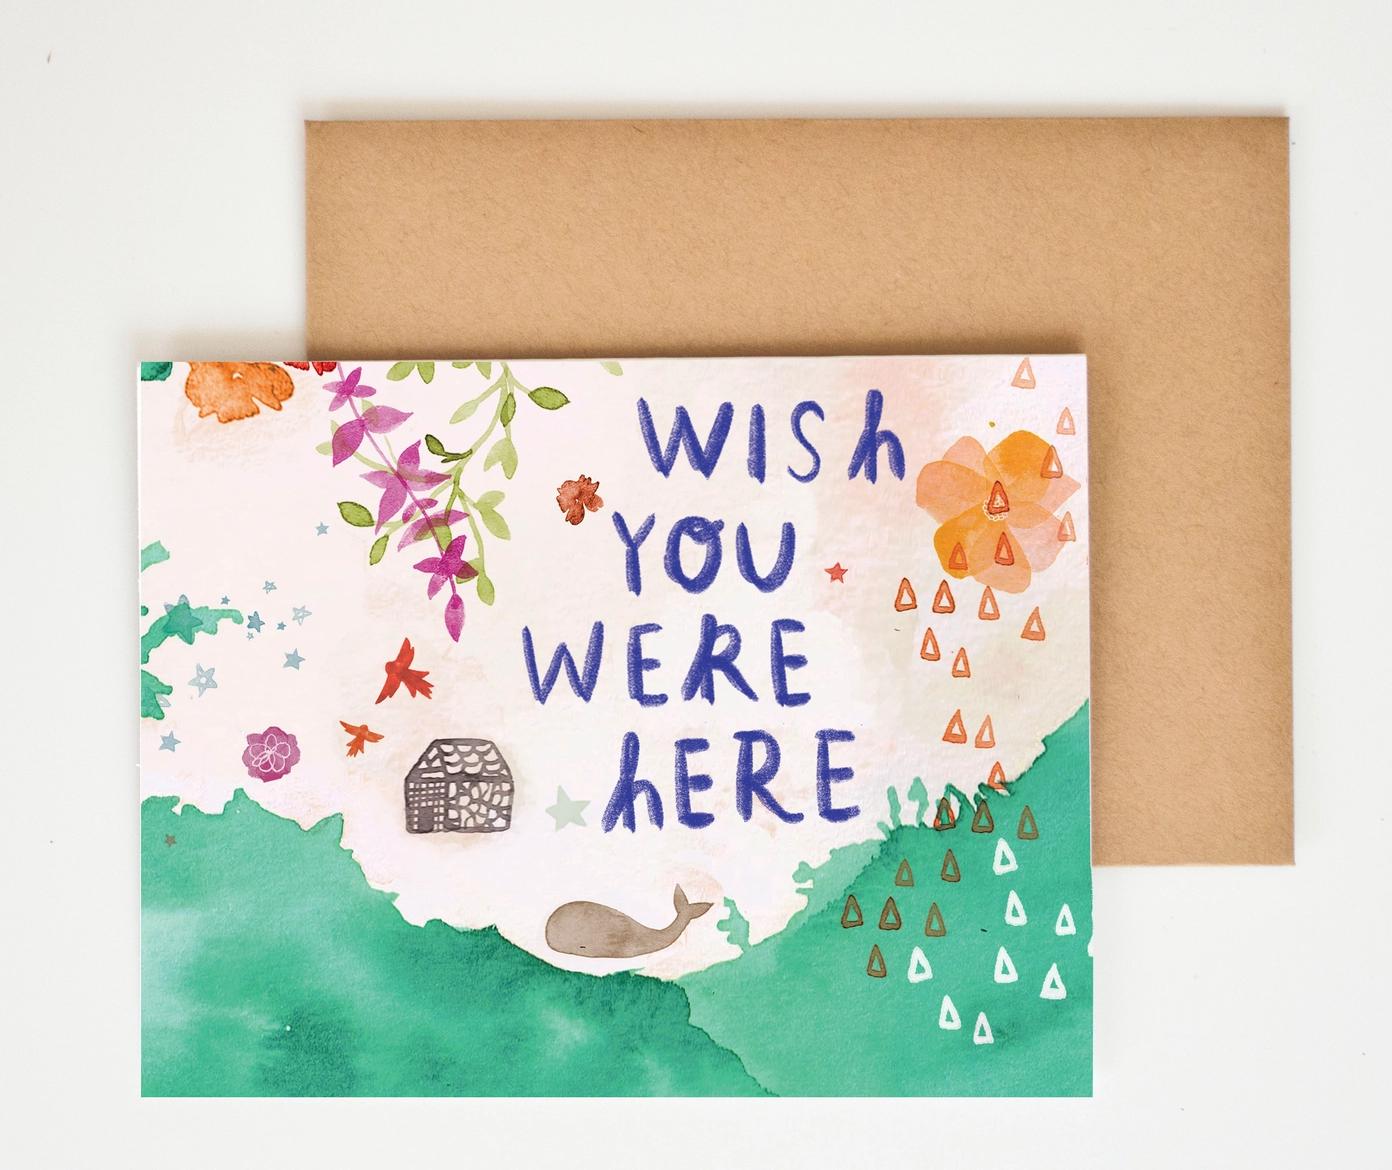 Meera Lee Patel Wish You Were Here Card